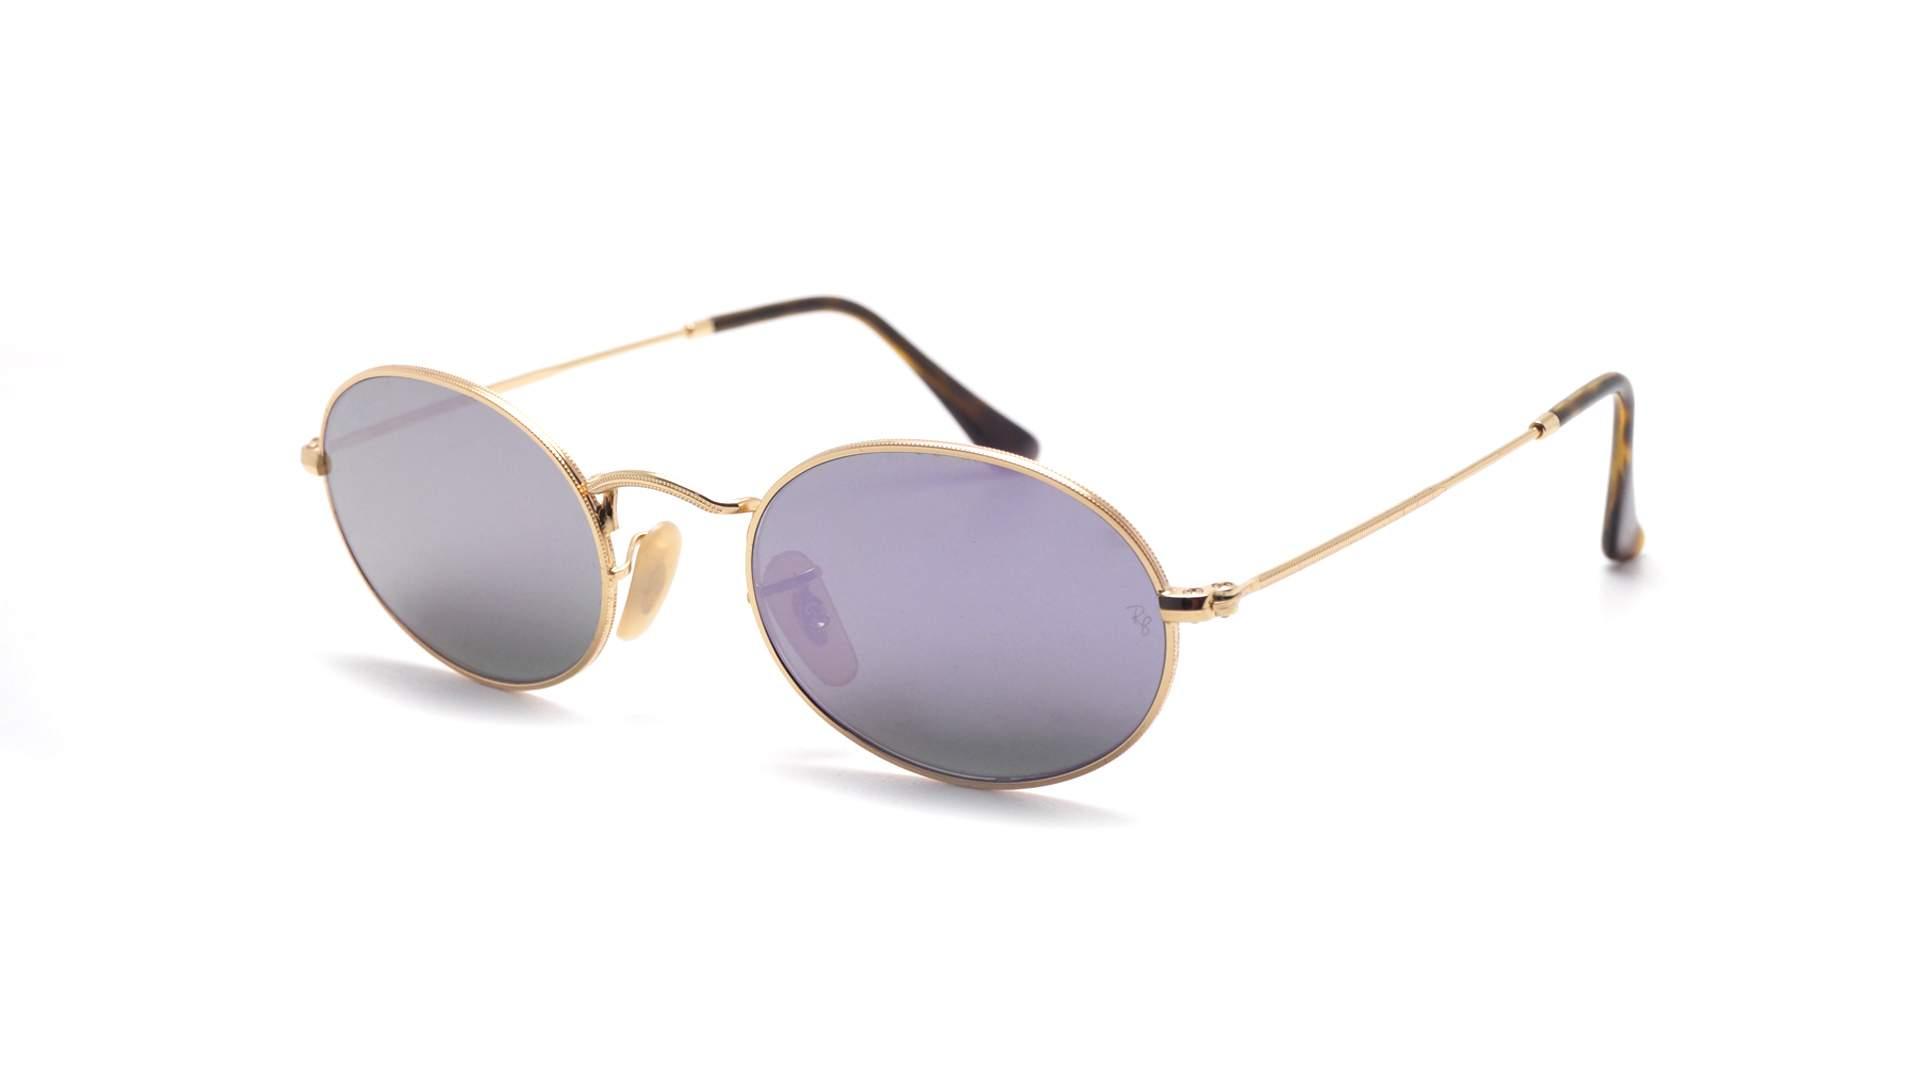 ca79c83d29 Sunglasses Ray-Ban Oval Flat Lenses Gold RB3547N 001 8O 51-21 Medium Mirror